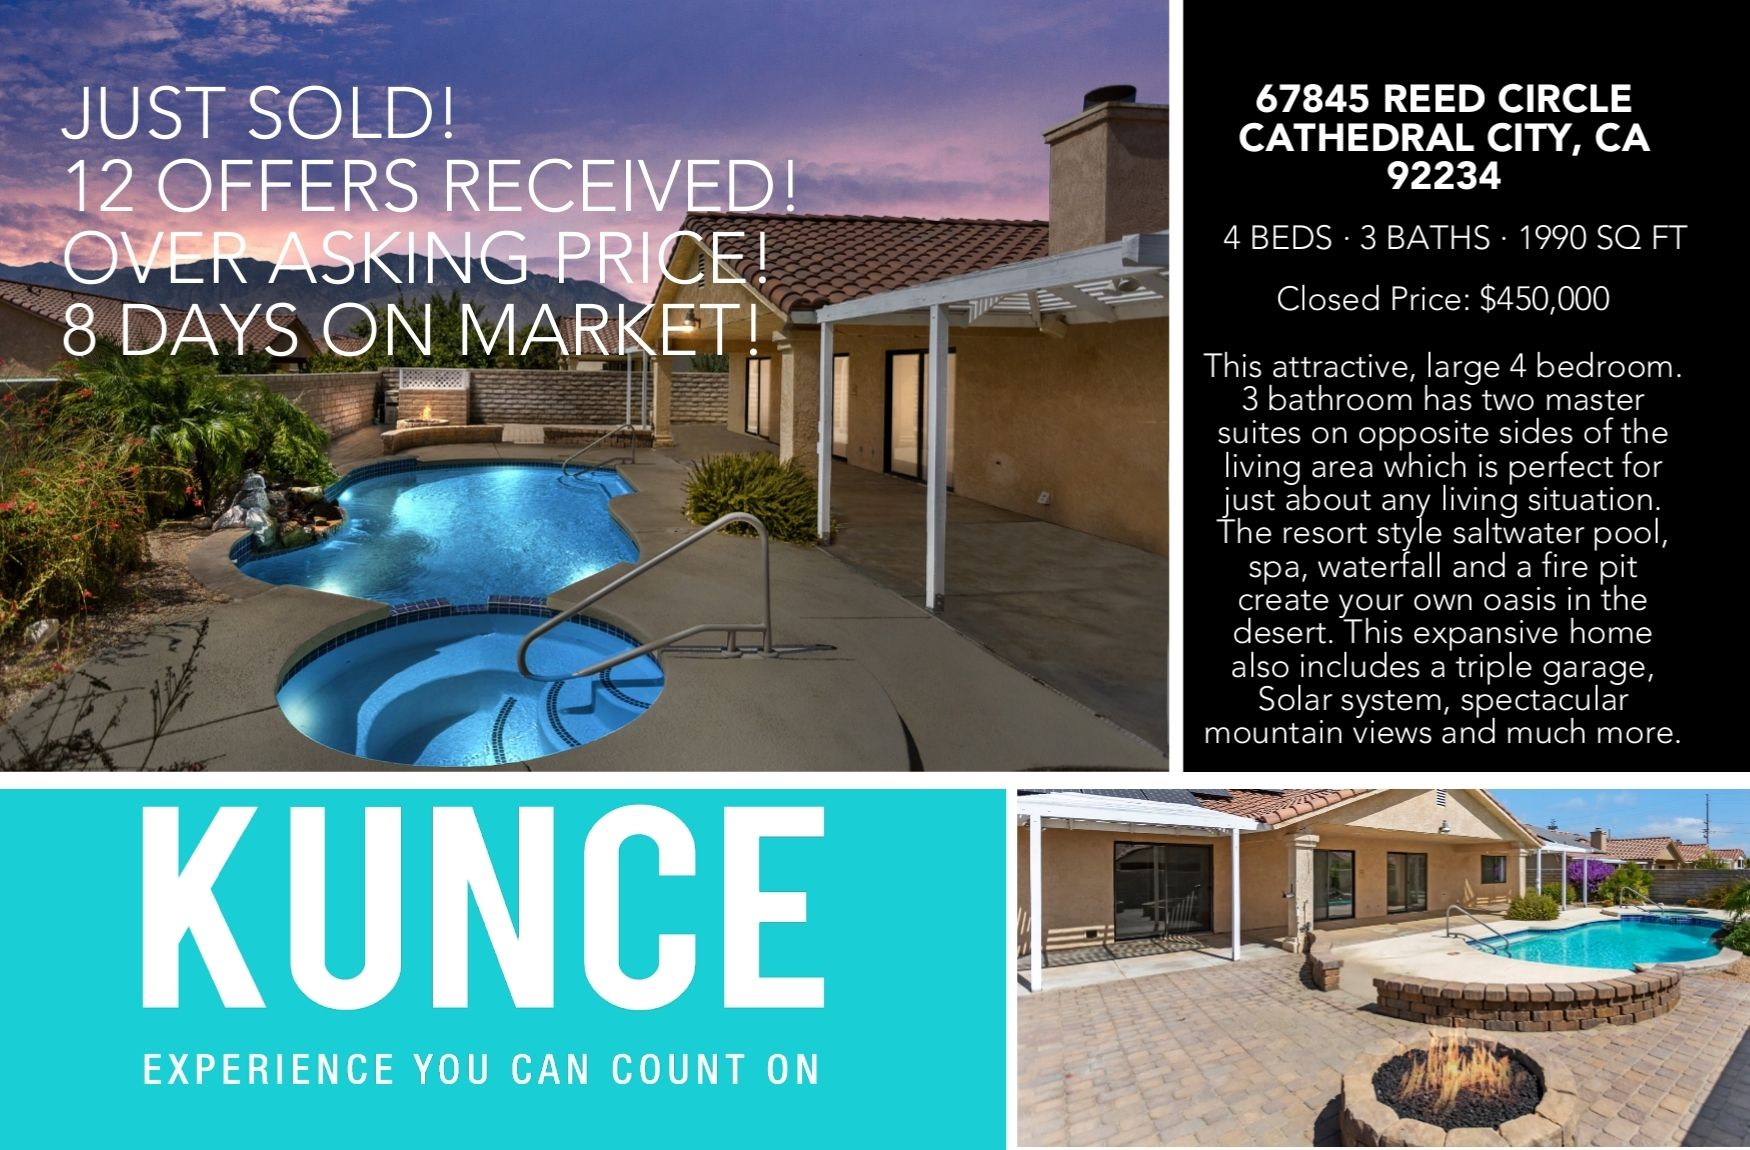 Palm Springs Real Estate Referral Transaction